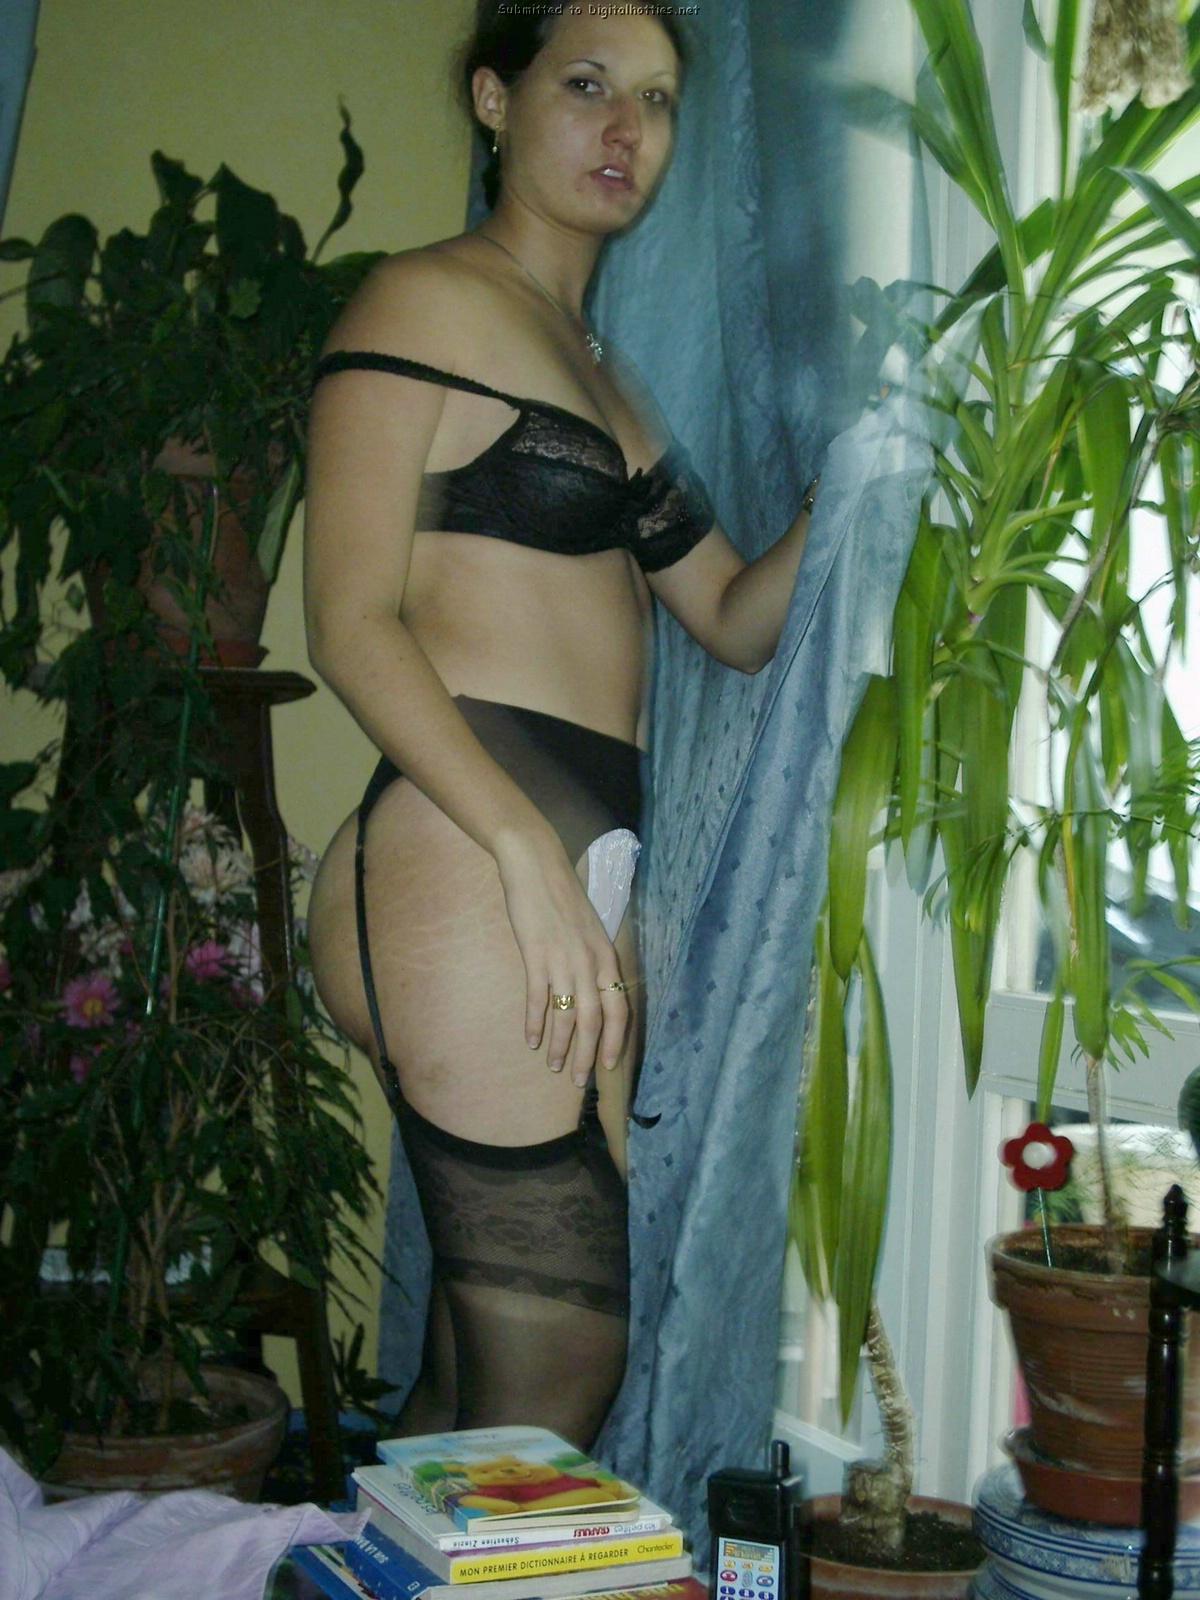 sanibel island nudists